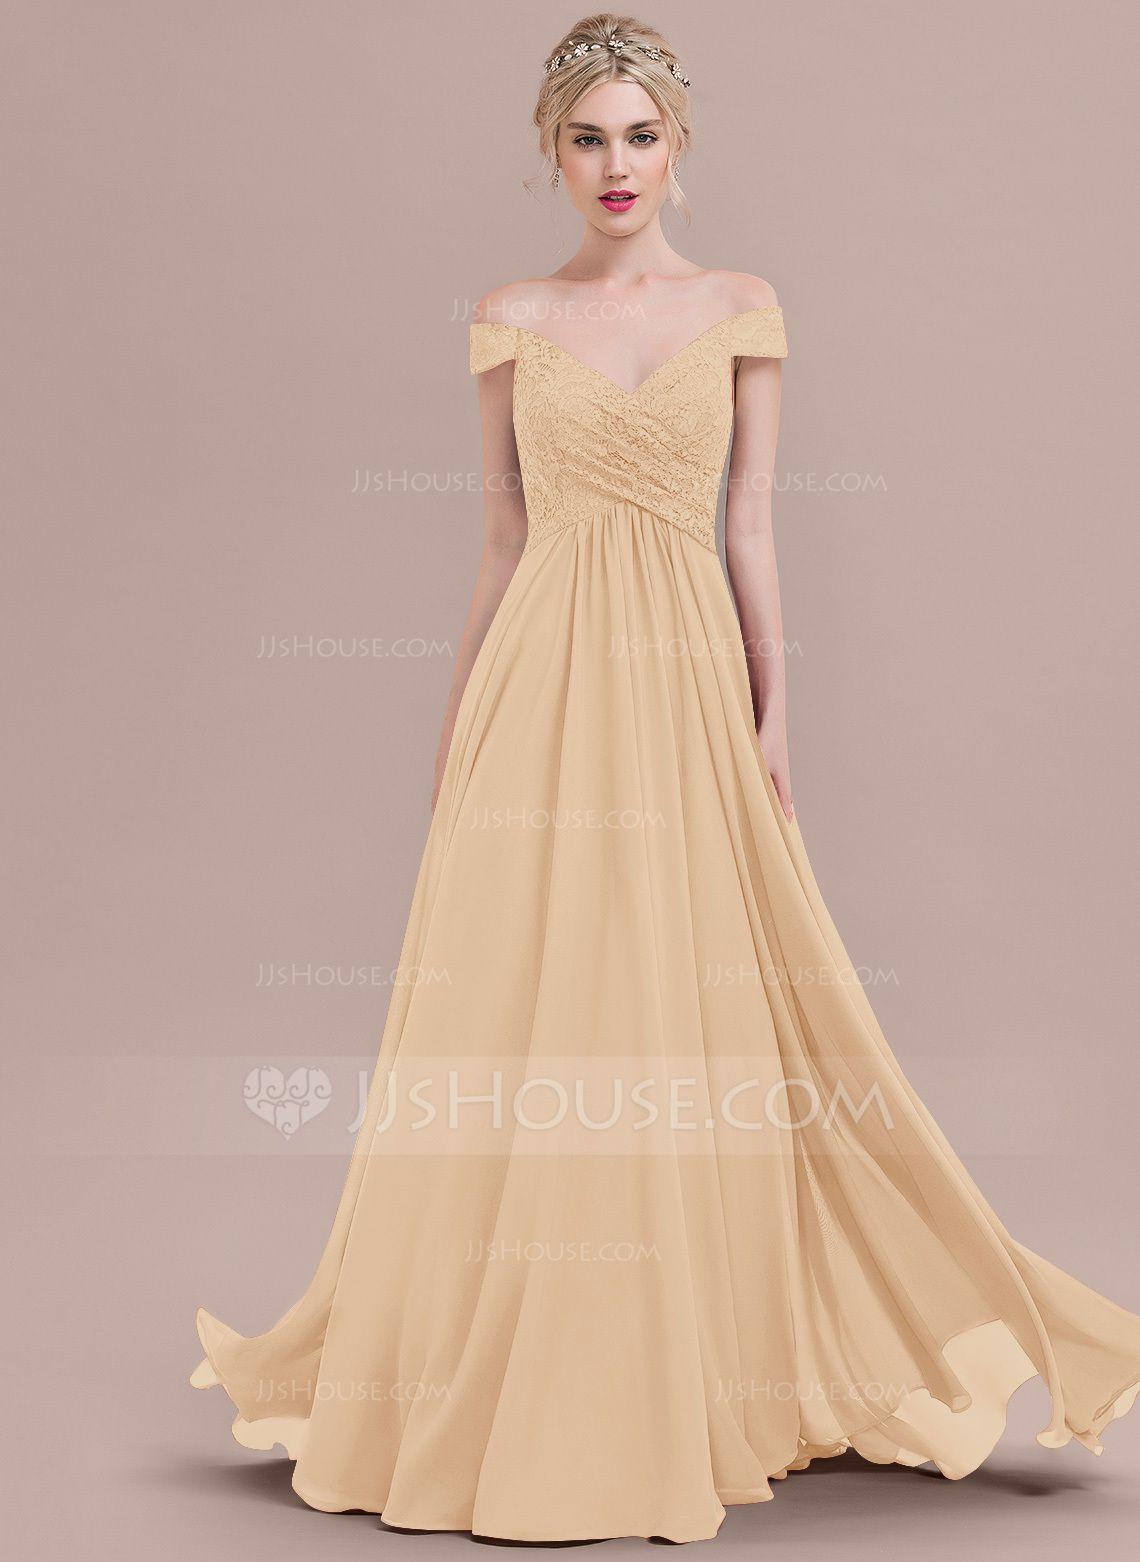 6d4fe83ea78 A-Line Princess Off-the-Shoulder Floor-Length Chiffon Lace Bridesmaid